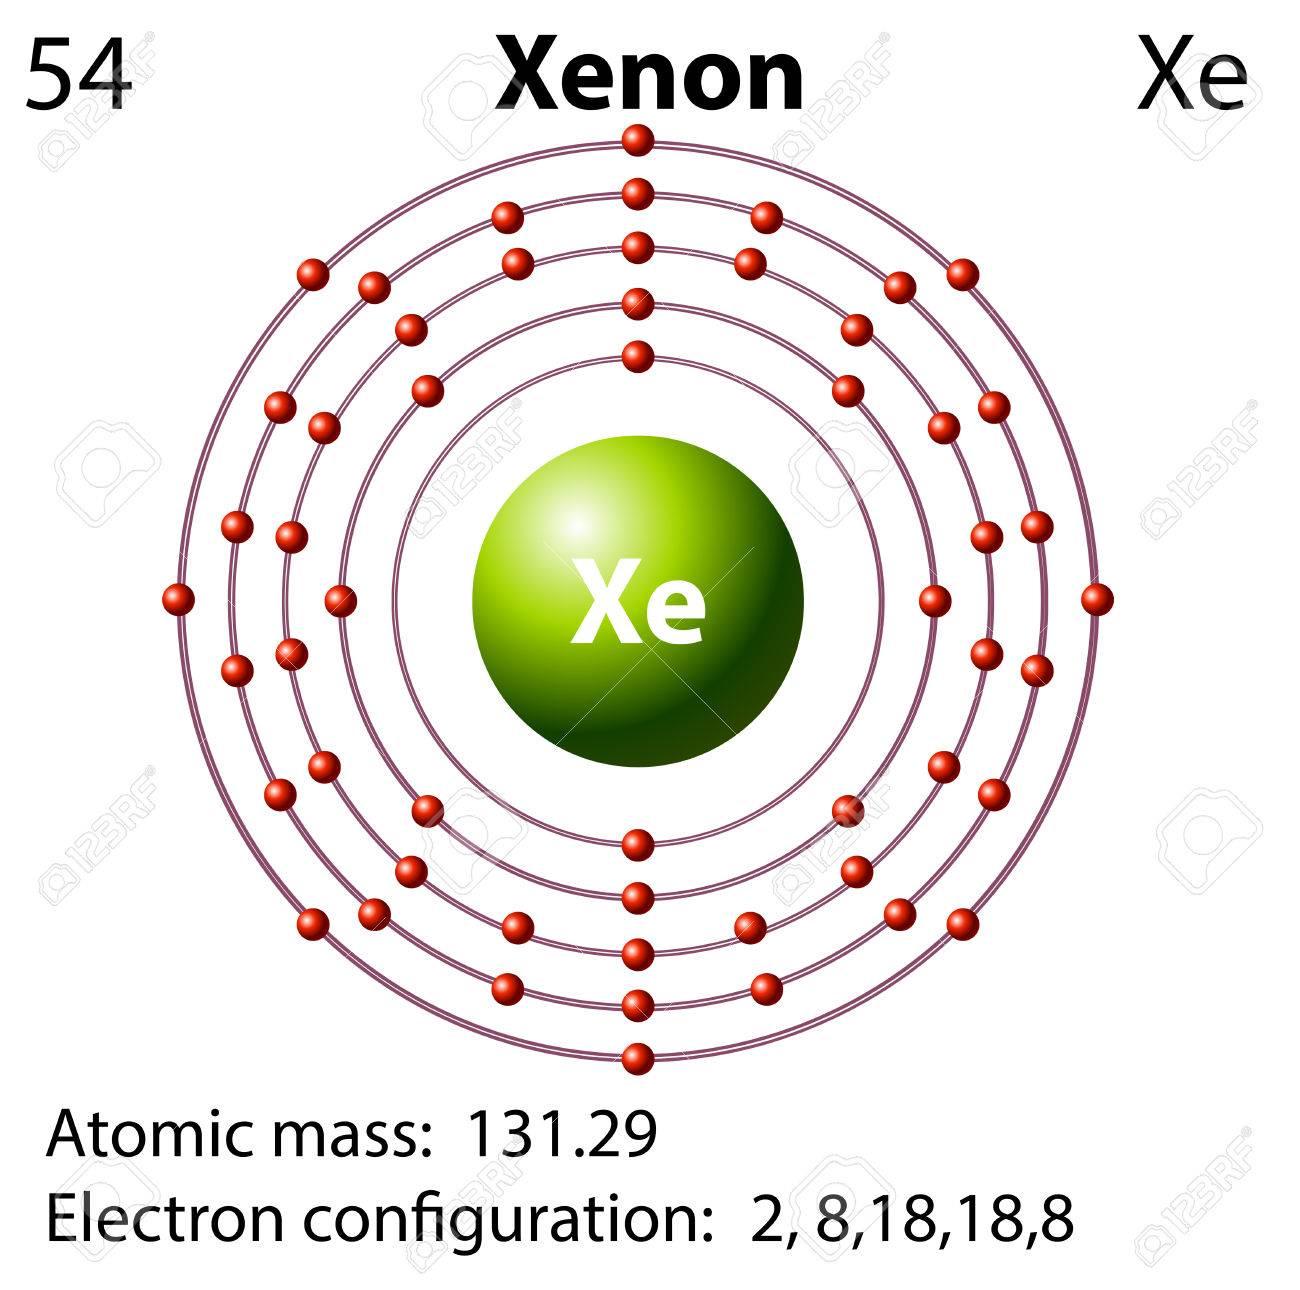 45301277 Symbol and electron diagram for Xenon illustration Stock Vector symbol and electron diagram for xenon illustration royalty free xenon diatomic at nearapp.co